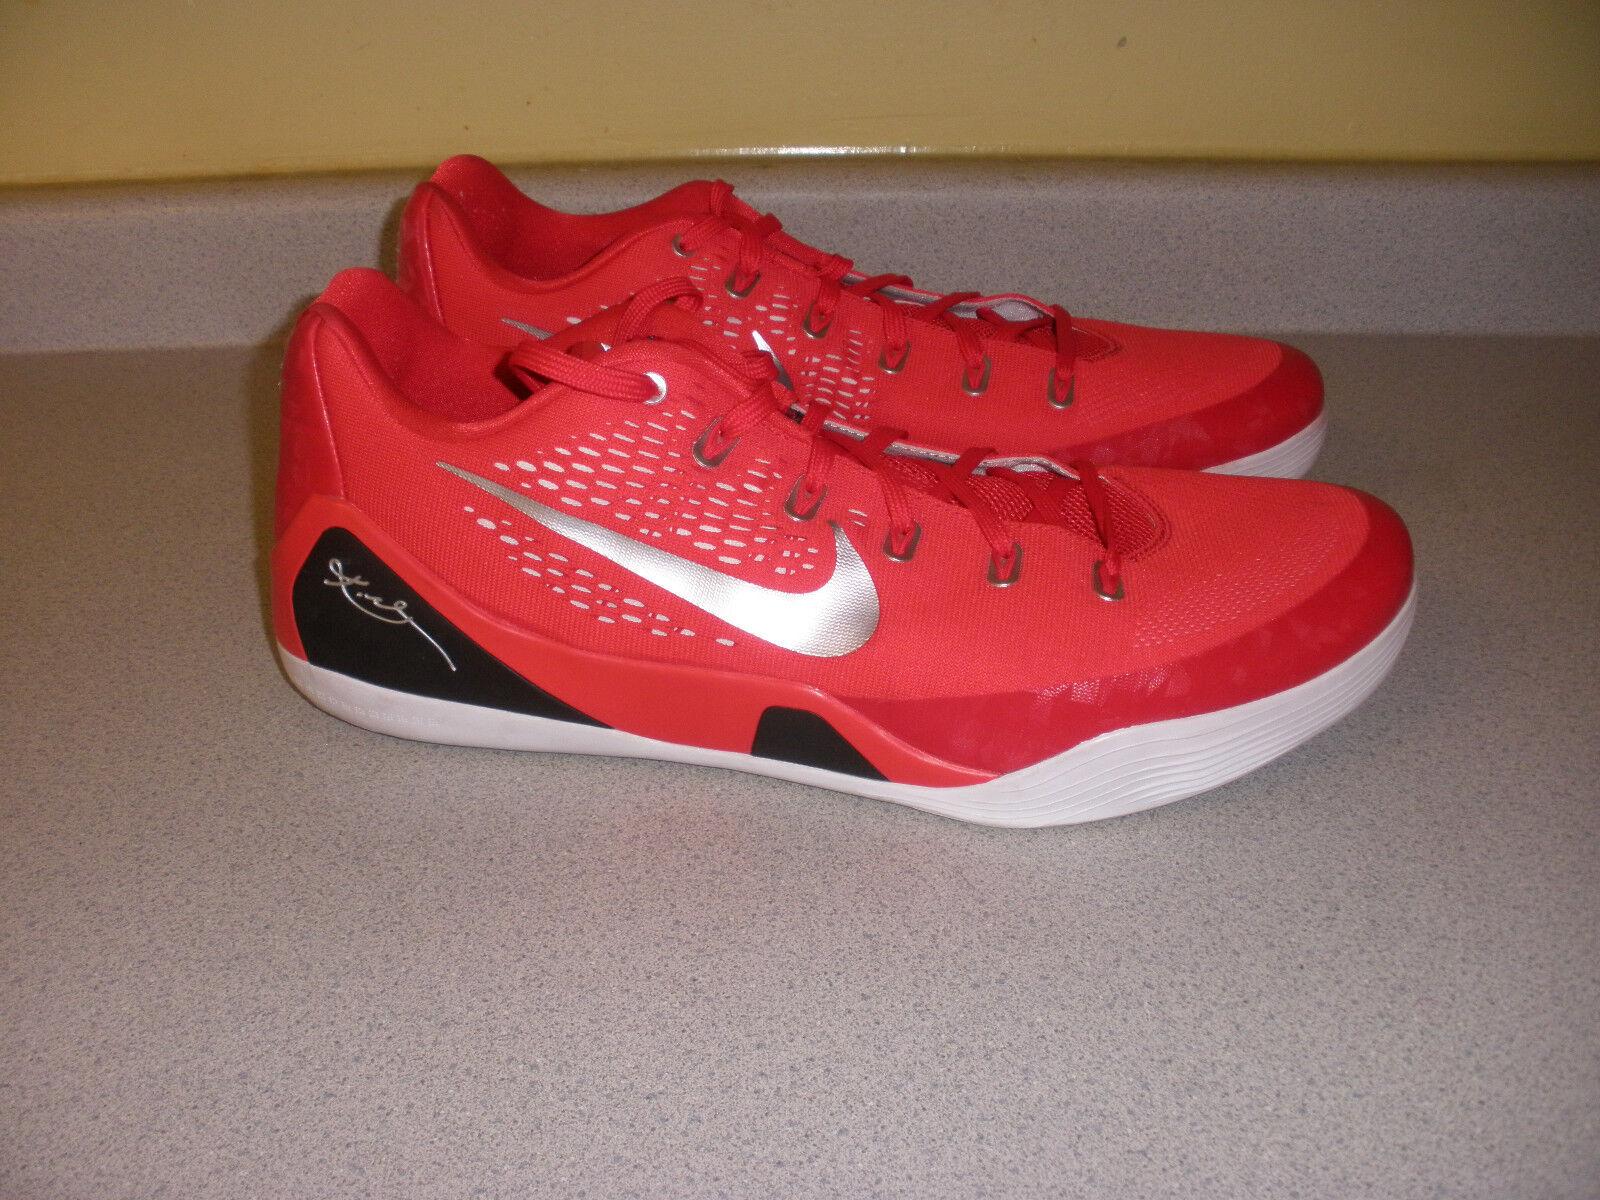 682776-602 NIKE Kobe IX 9 Men's Basketball Shoes Size 18 RED